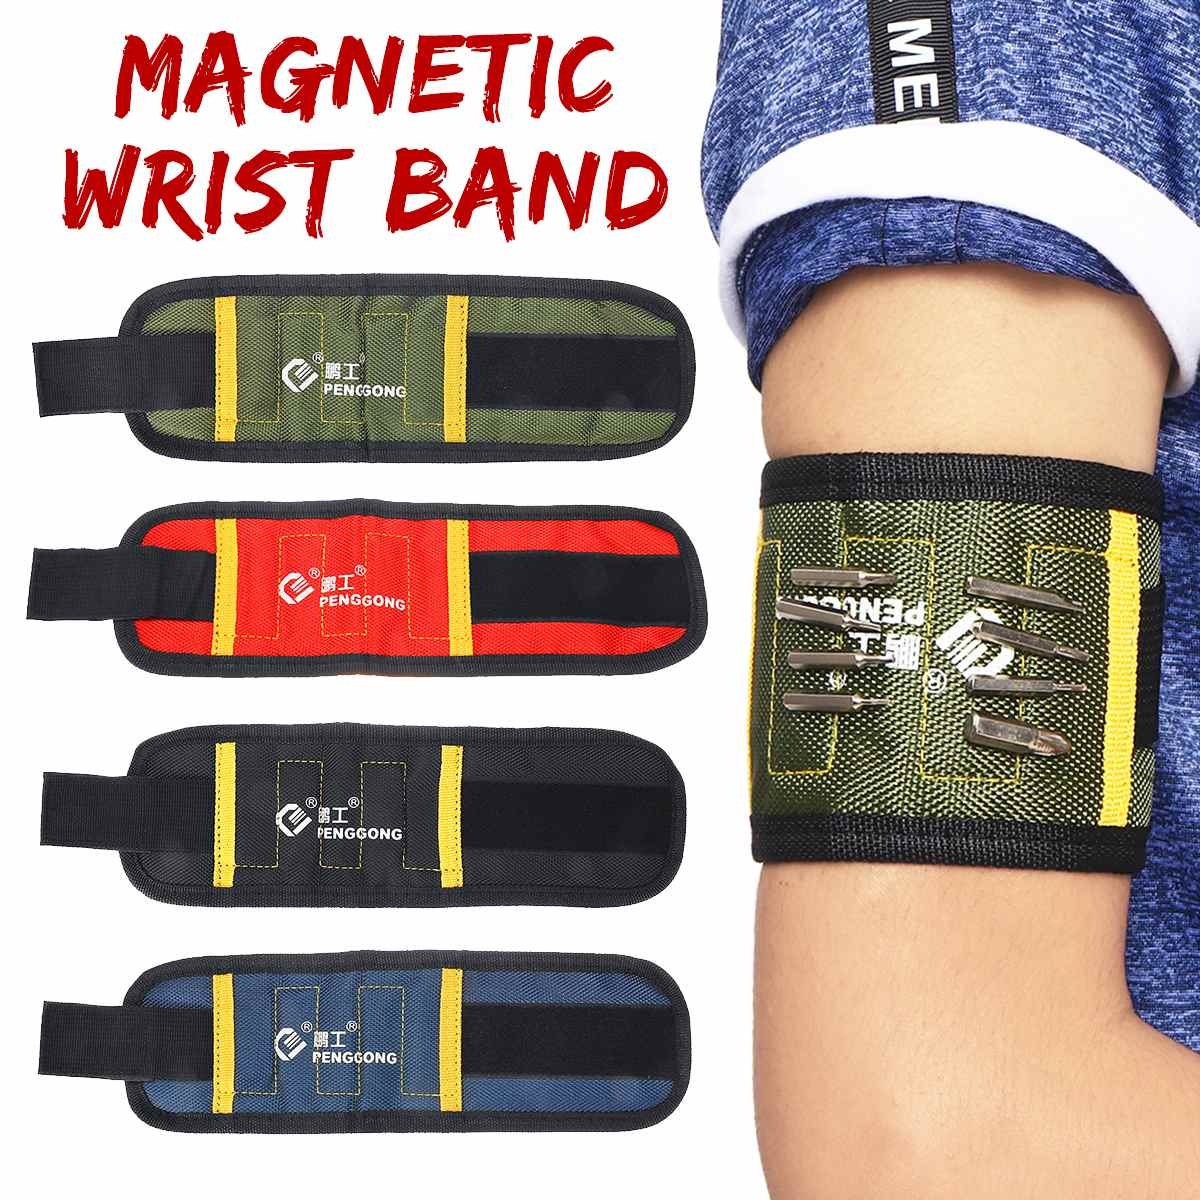 New Magnetic Wristband Portable Tool Bag Screw Nail Holder Wrist Band Tool Belt Screws Nails Drill Bits Bracelet For Repair Tool